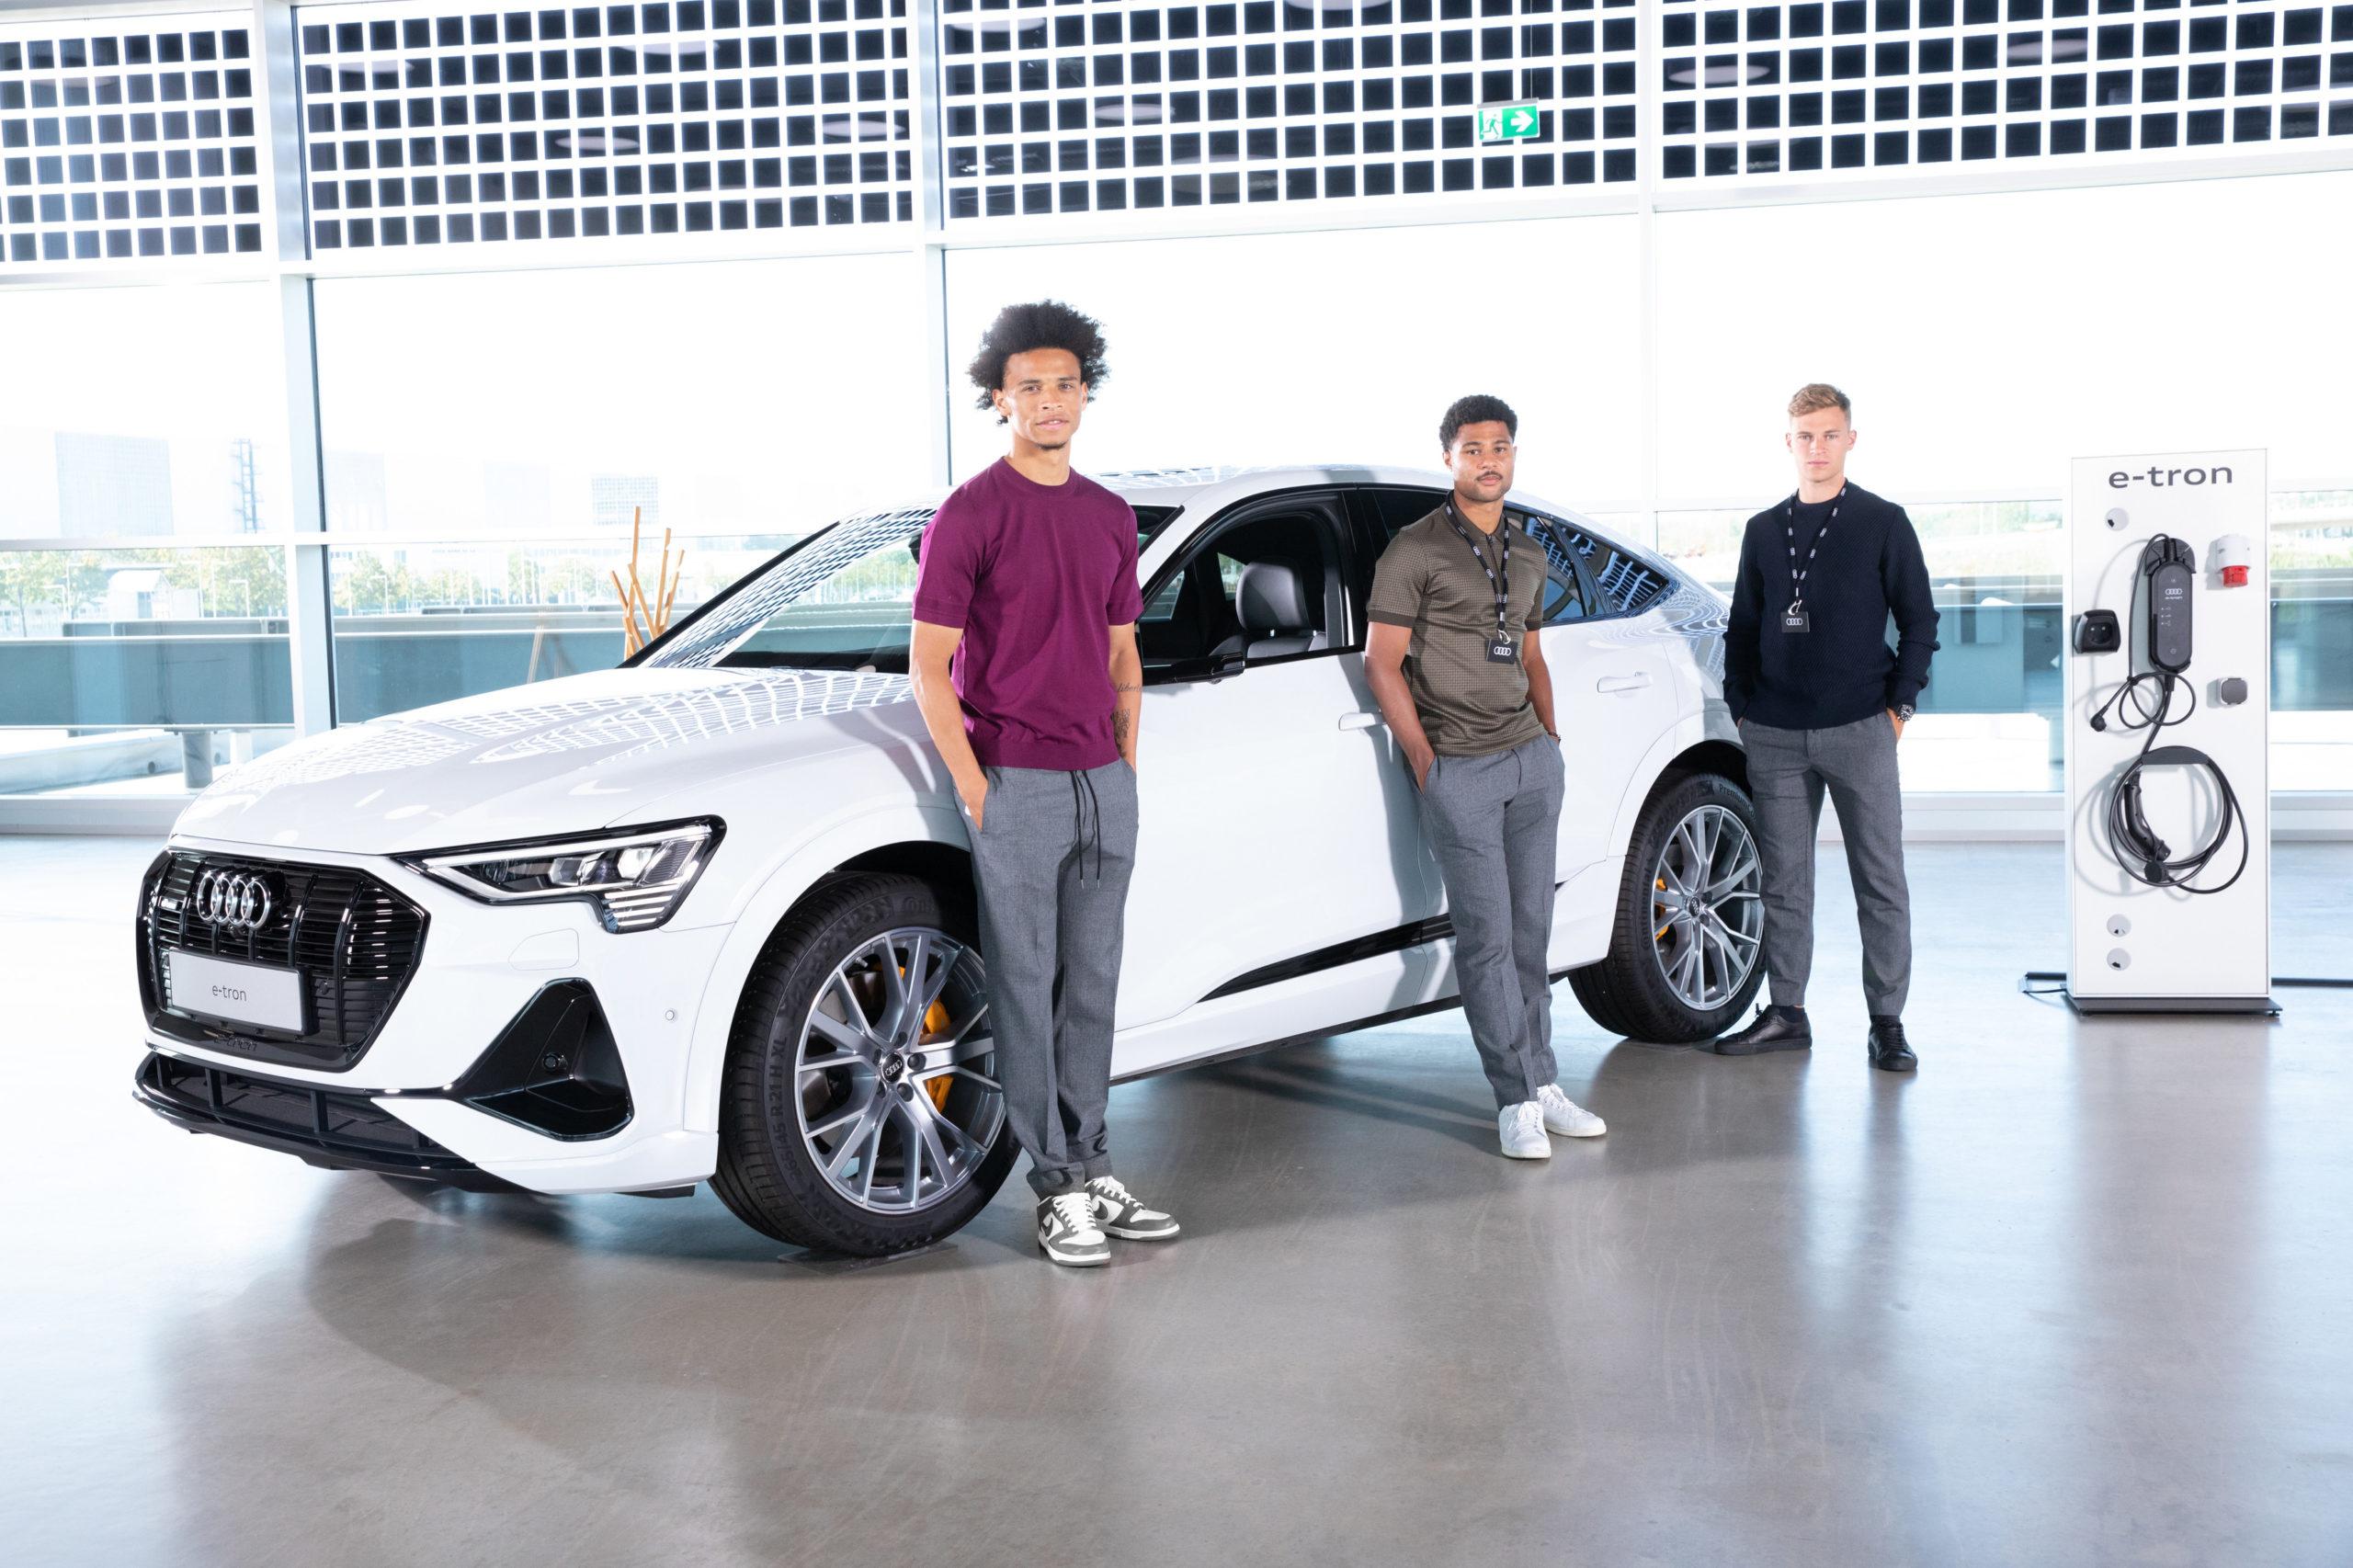 Audi electrifies FC Bayern Munich (Photos) - Brand Spur